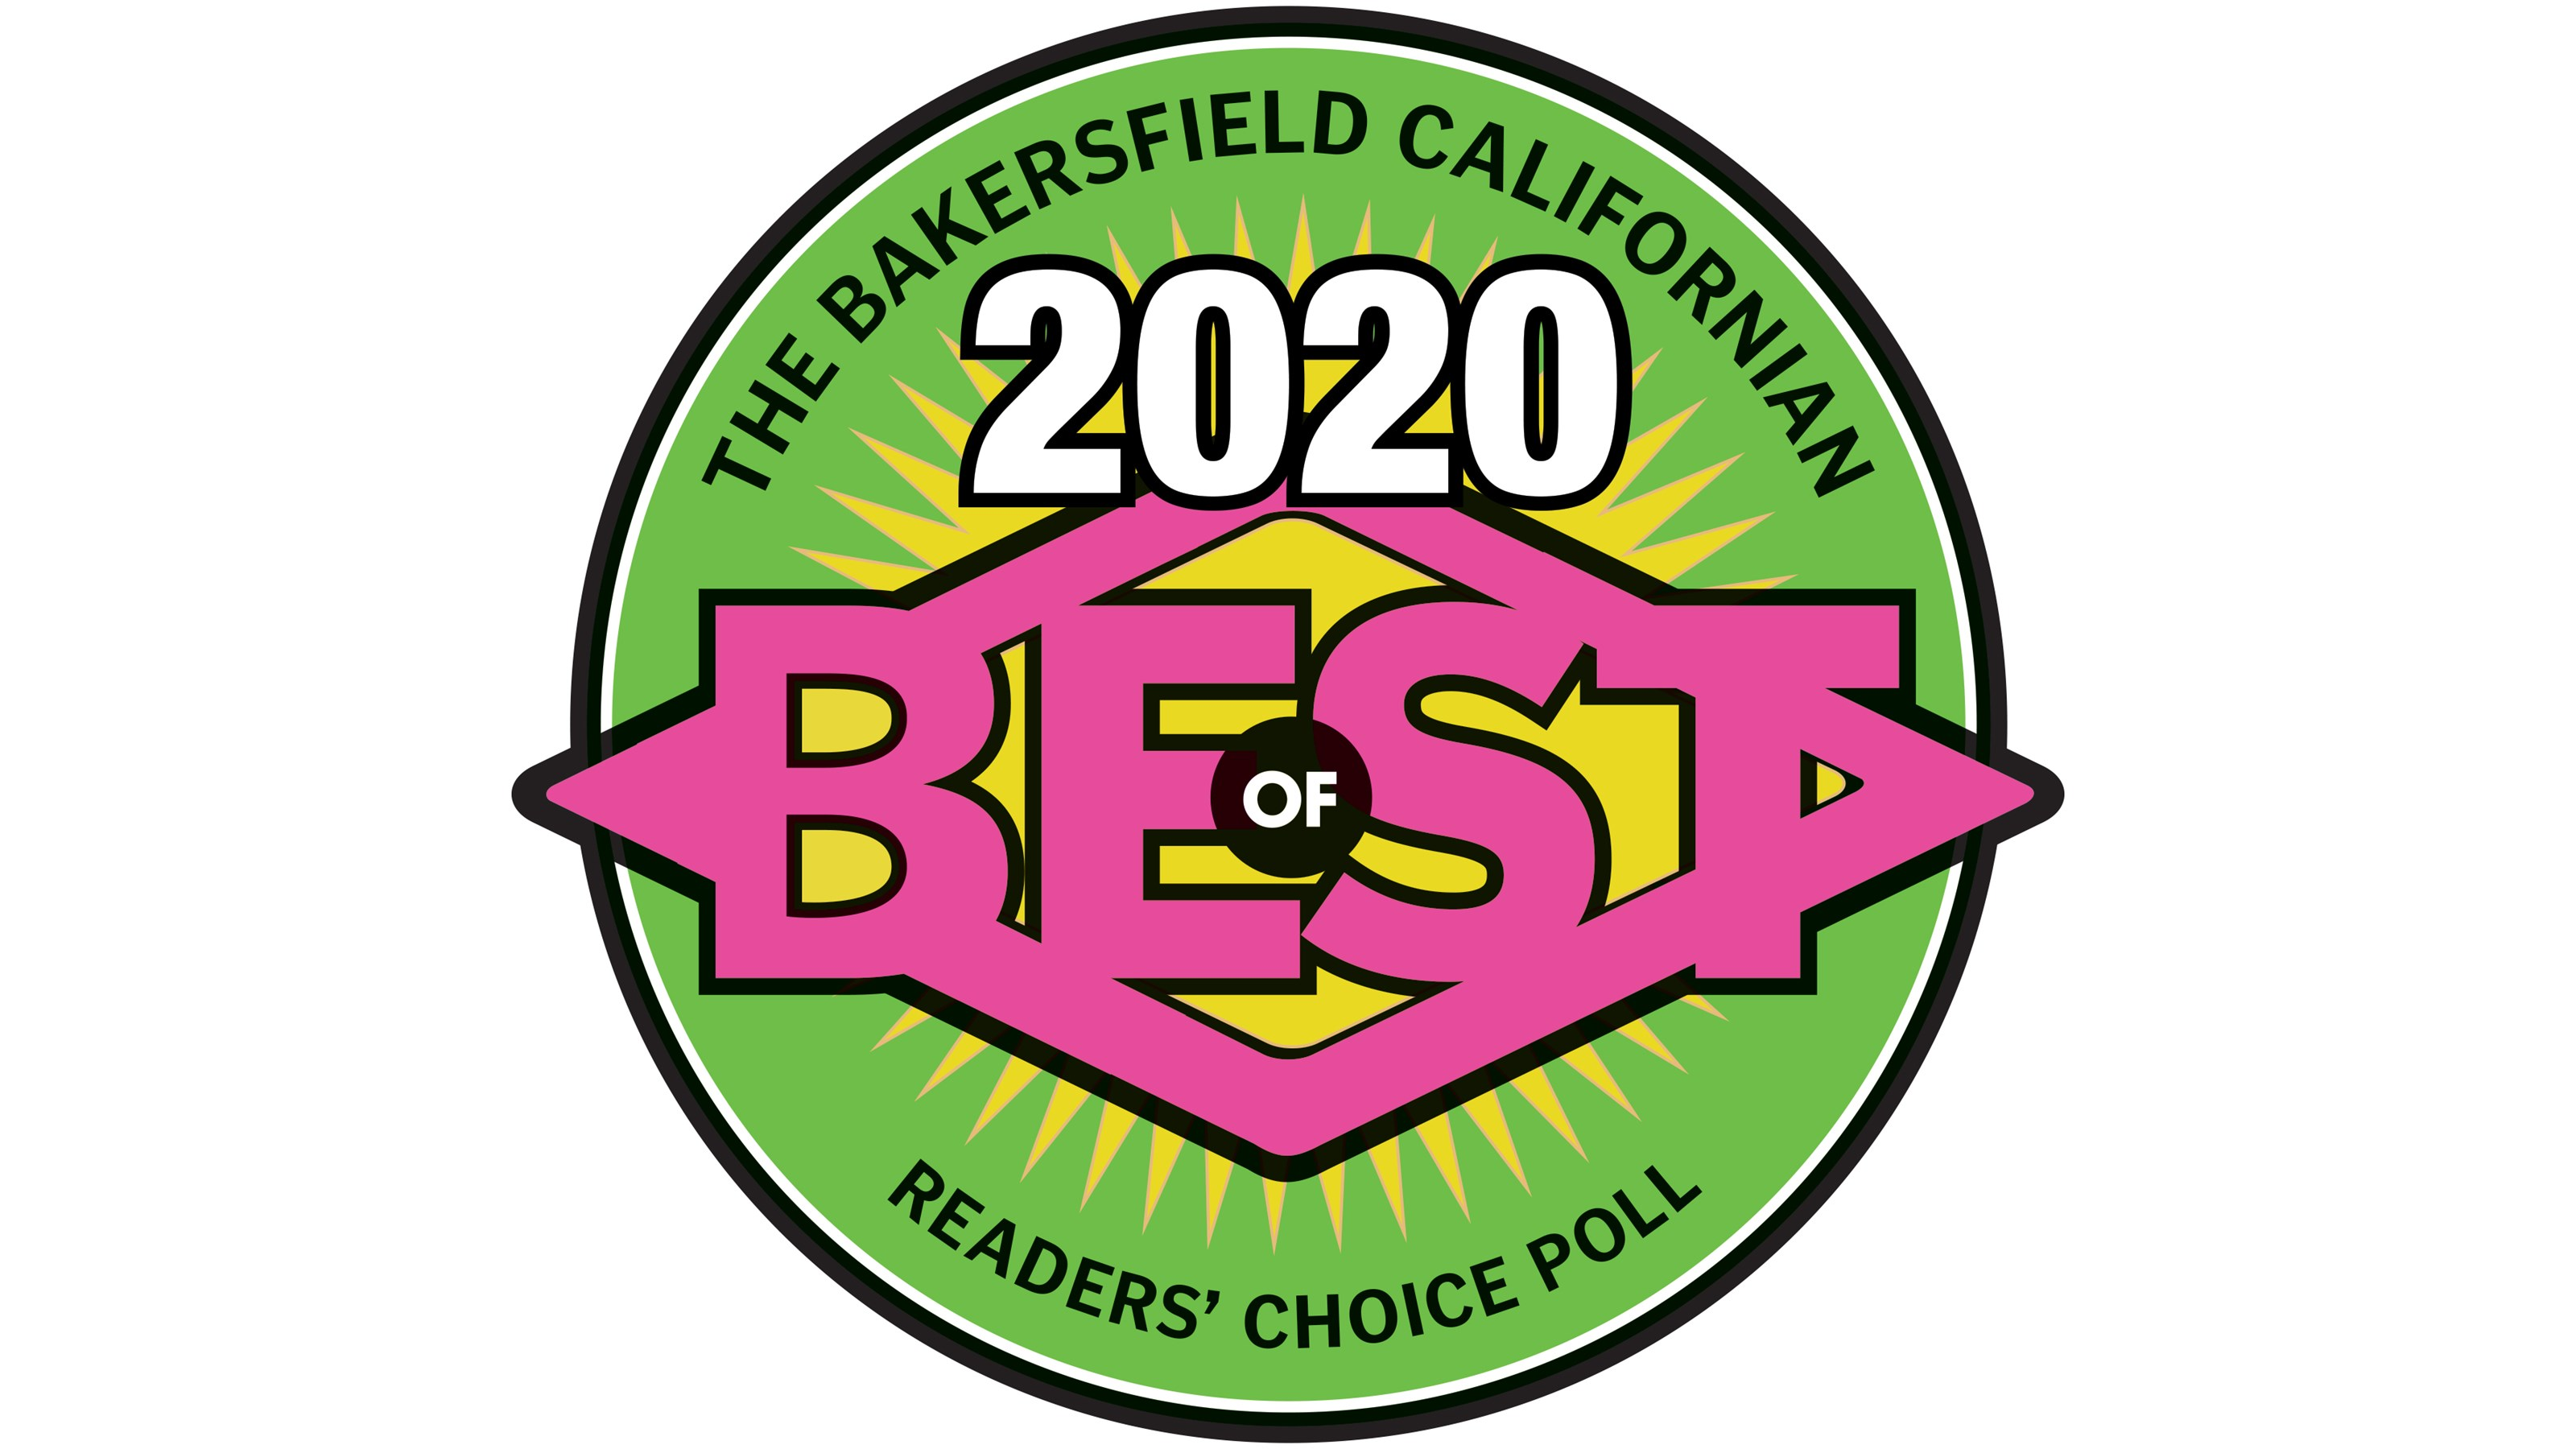 Halloween Town Bakersfield 2020 Best Annual Event   Arts & Entertainment   Bakersfield 2019